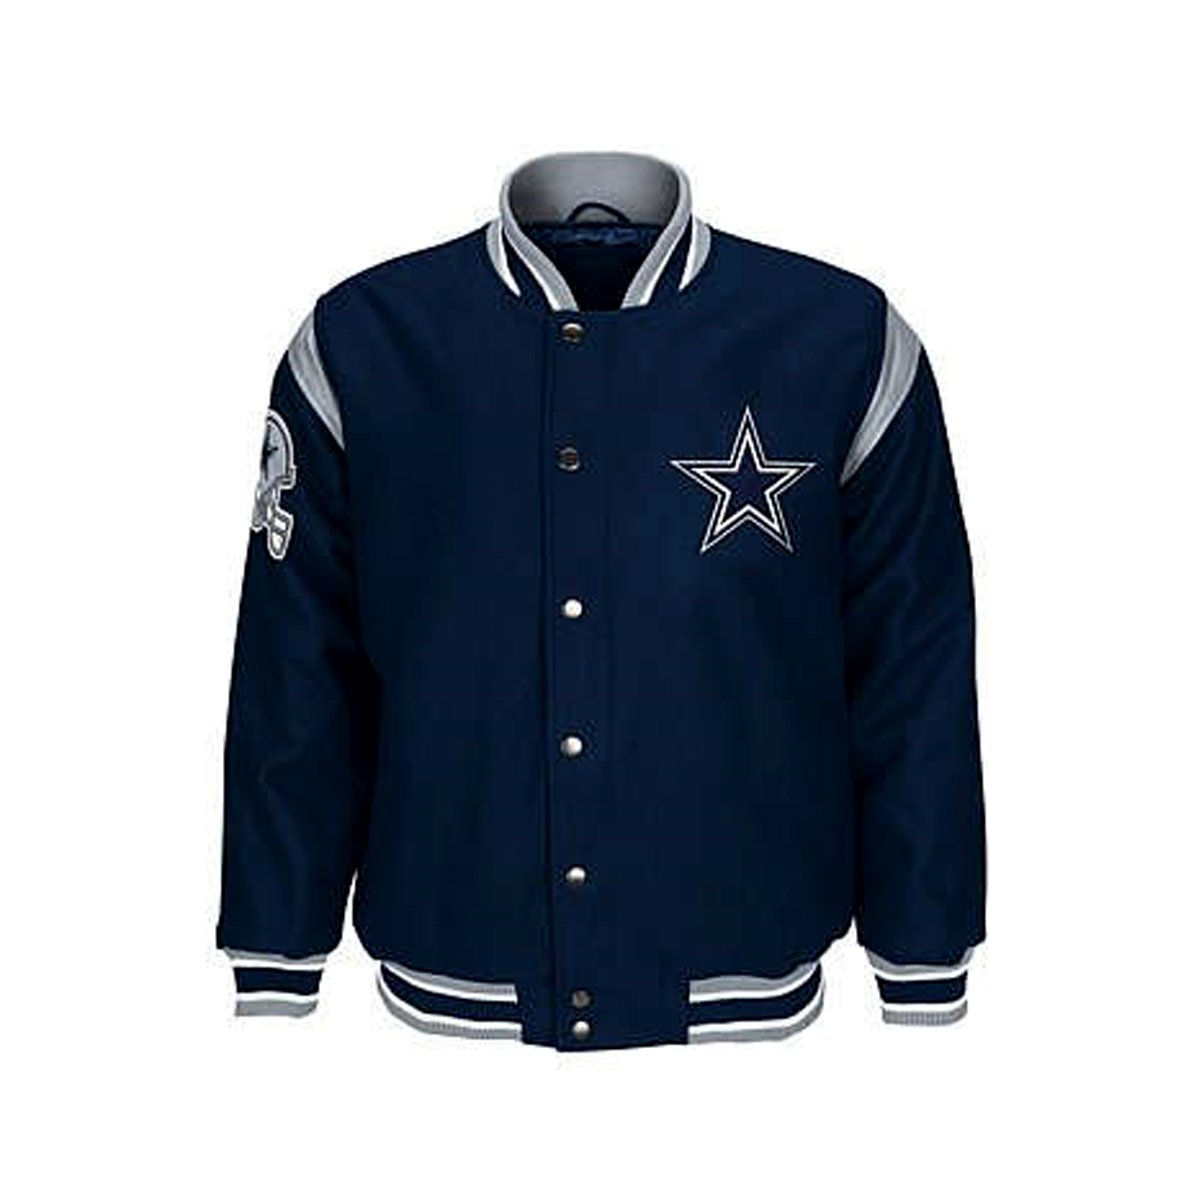 Amazon.com   Dallas Cowboys Jacket Cowboys Leather Wool Coat NFL Apparel  (XXL)   Sports   Outdoors e22ac63a1